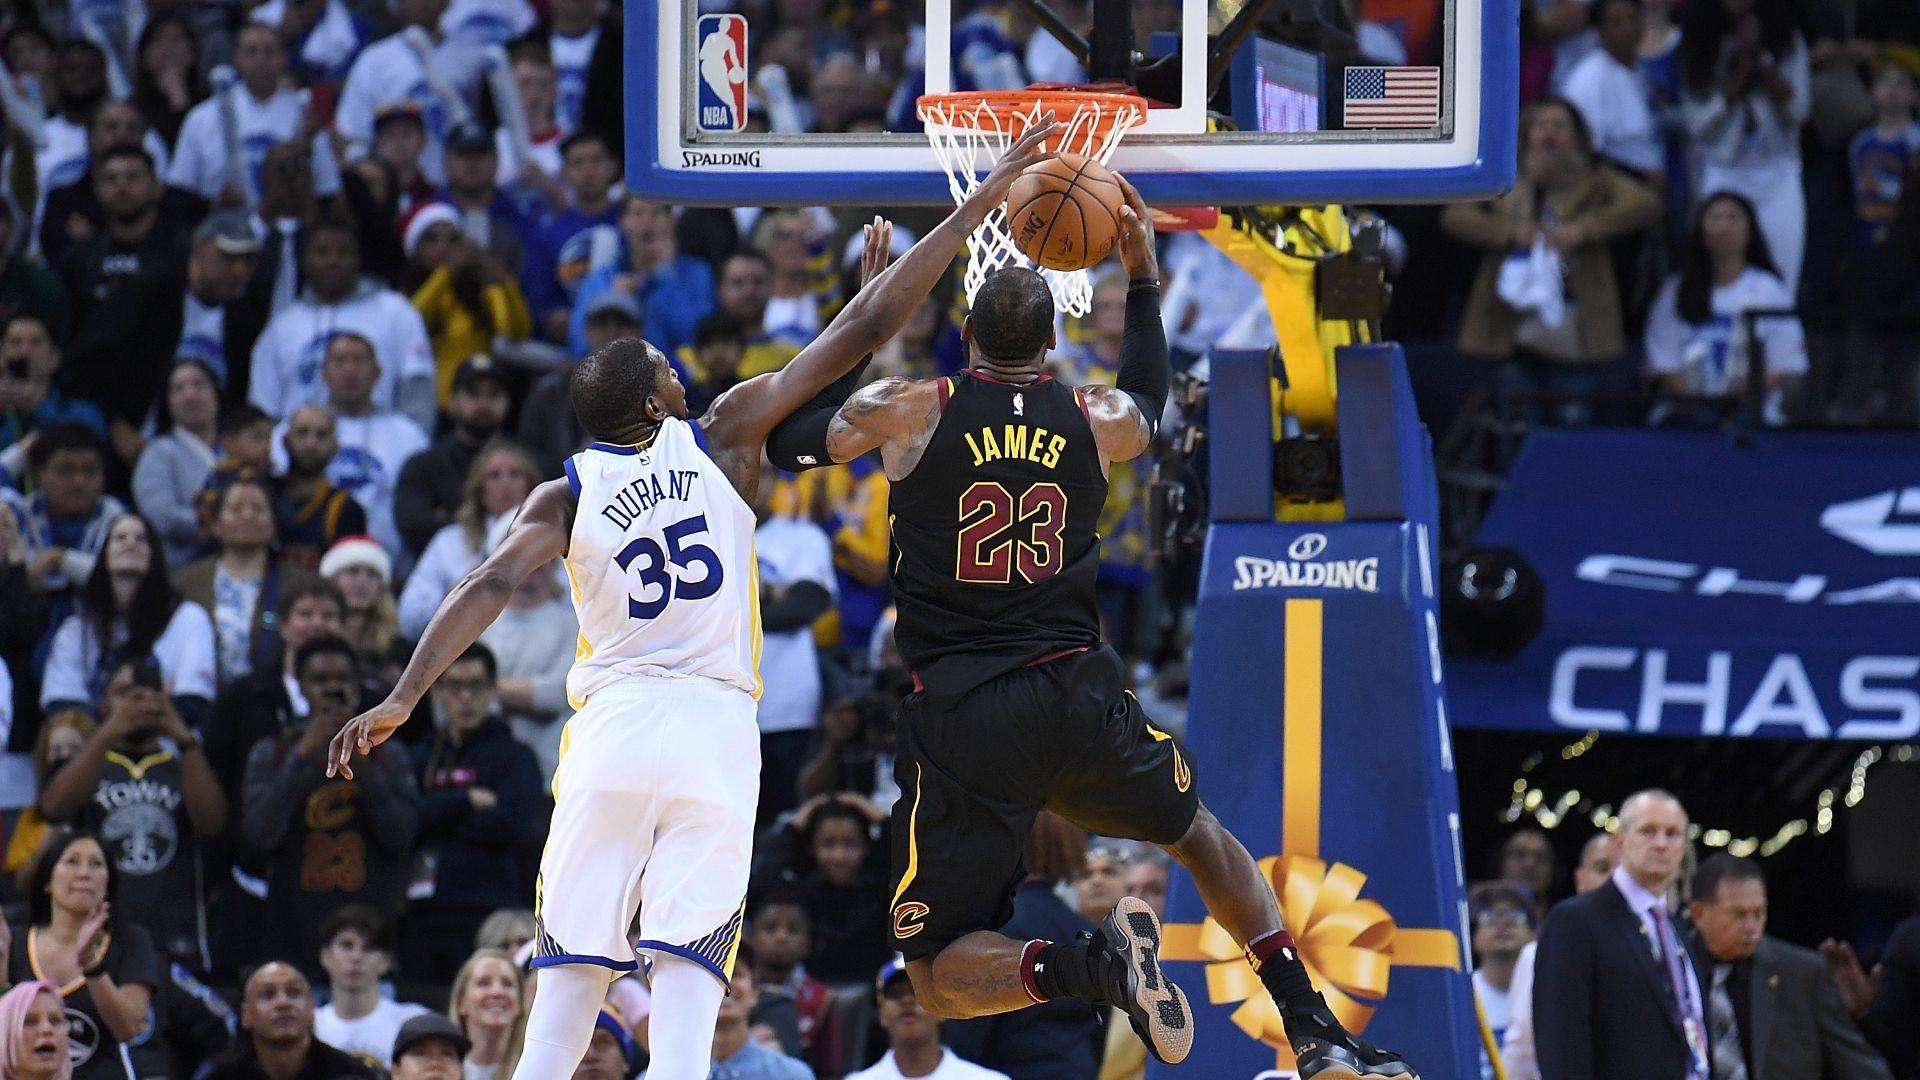 https://secure.espncdn.com/combiner/i?img=/media/motion/2017/1225/dm_171225_NBA_LeBron_vs_Durant/dm_171225_NBA_LeBron_vs_Durant.jpg